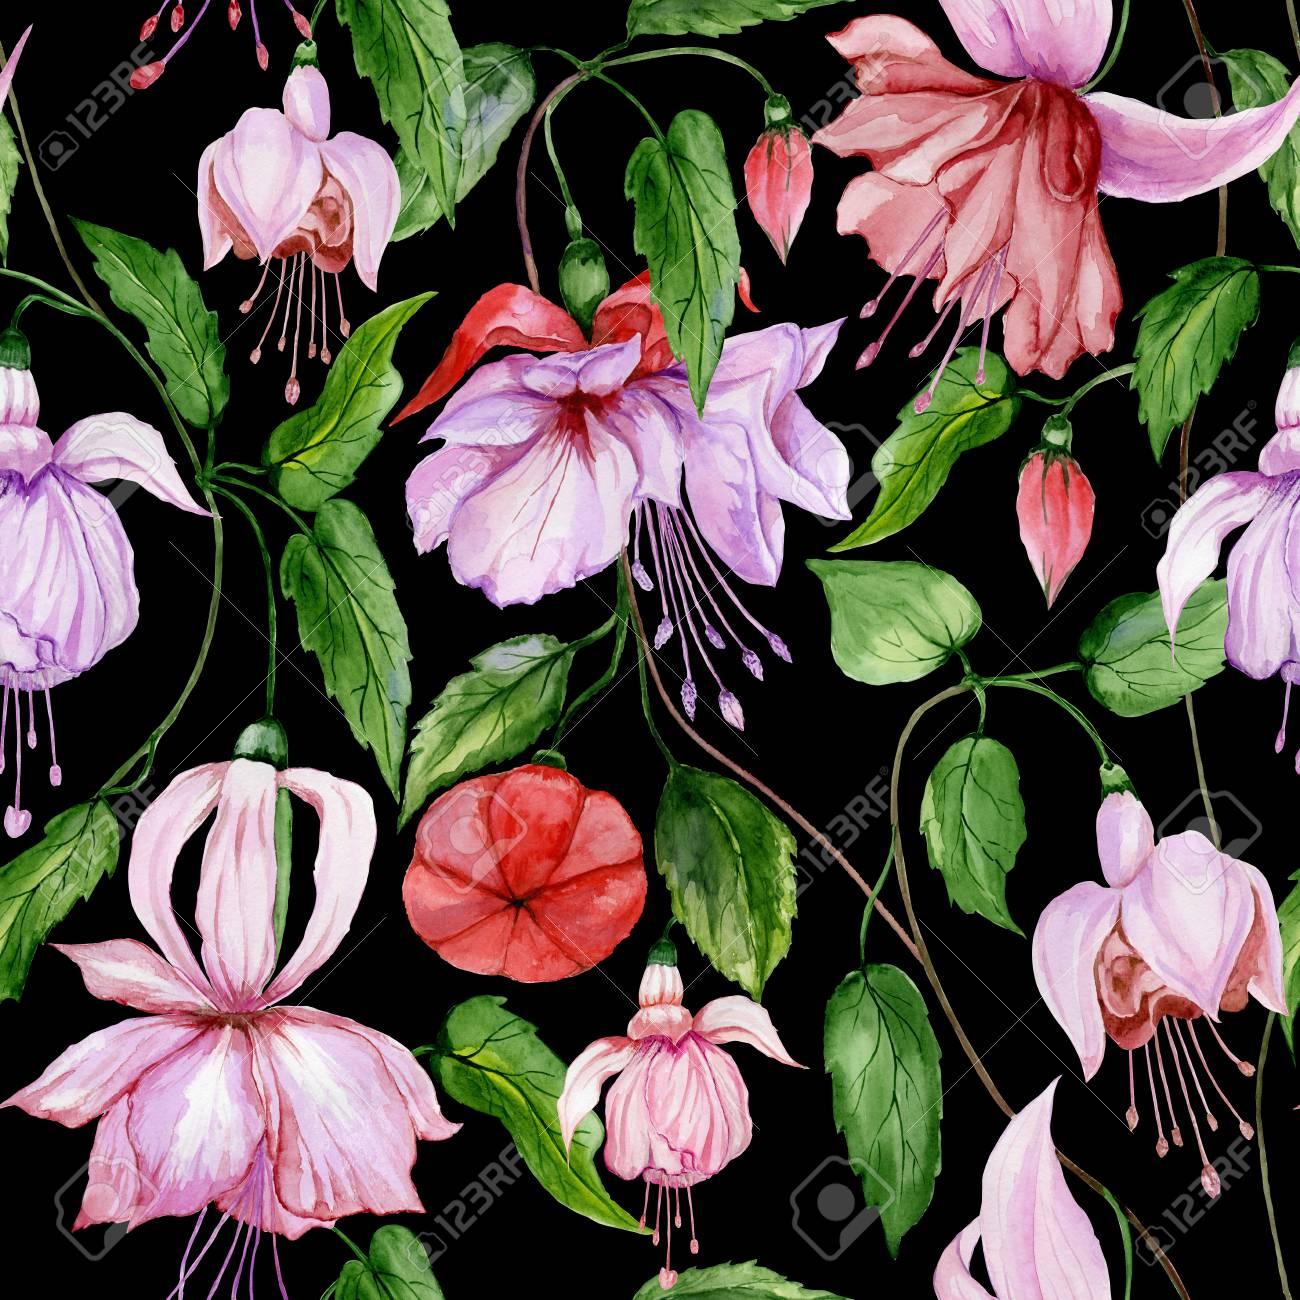 Beautiful Fuchsia Flowers On Climbing Twigs On Black Background